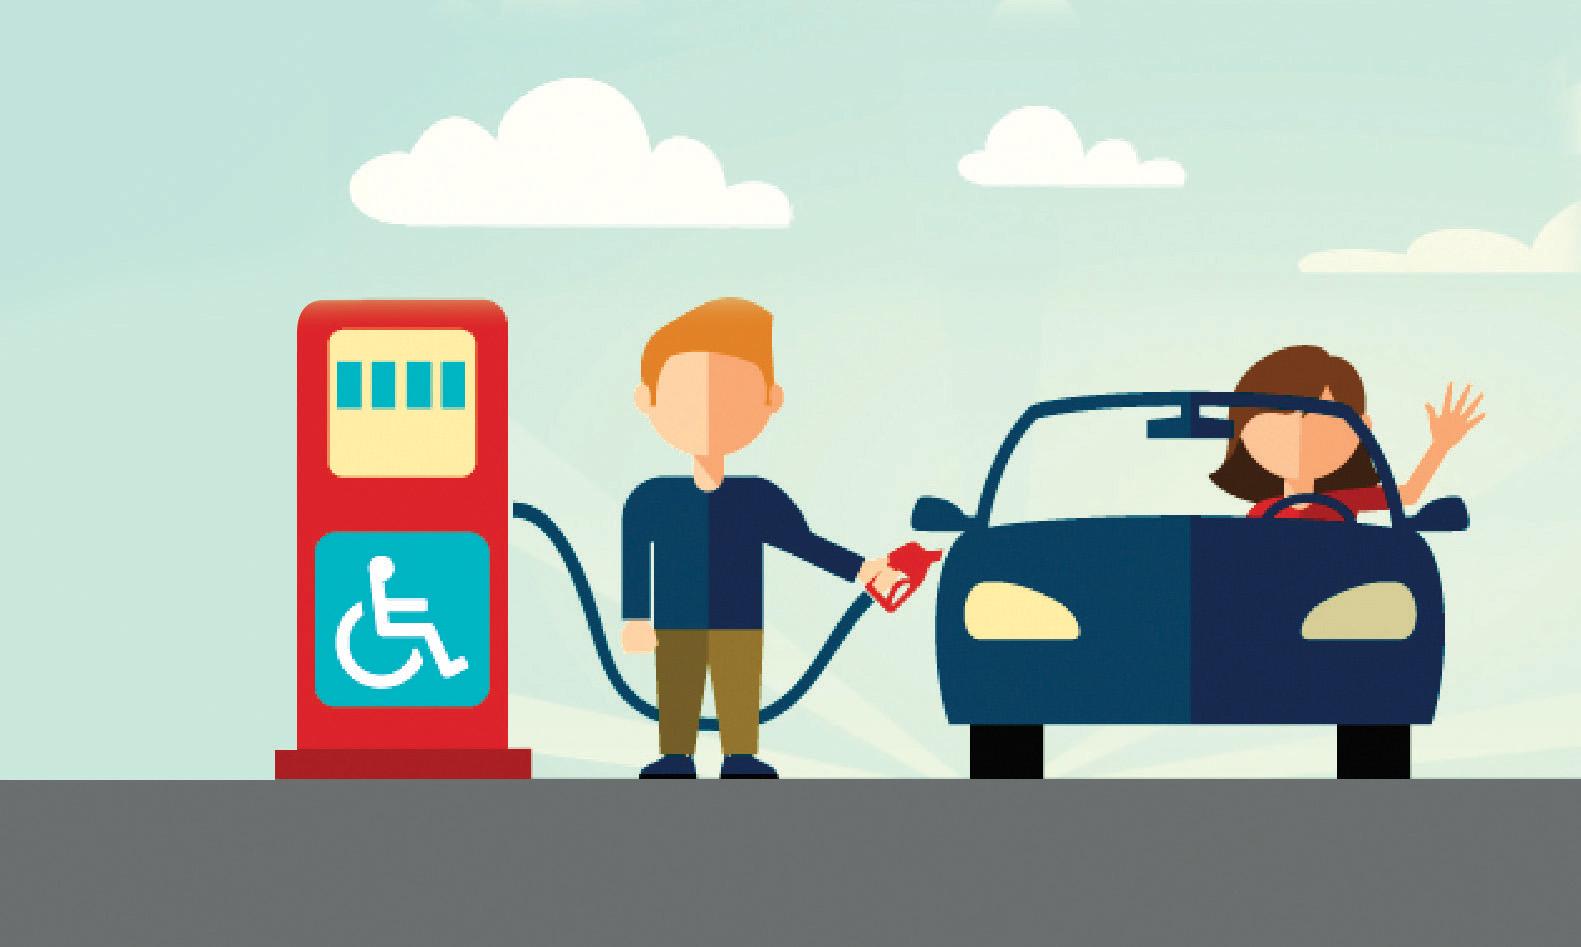 Cartoon man filling up a car at an accessible gas pump